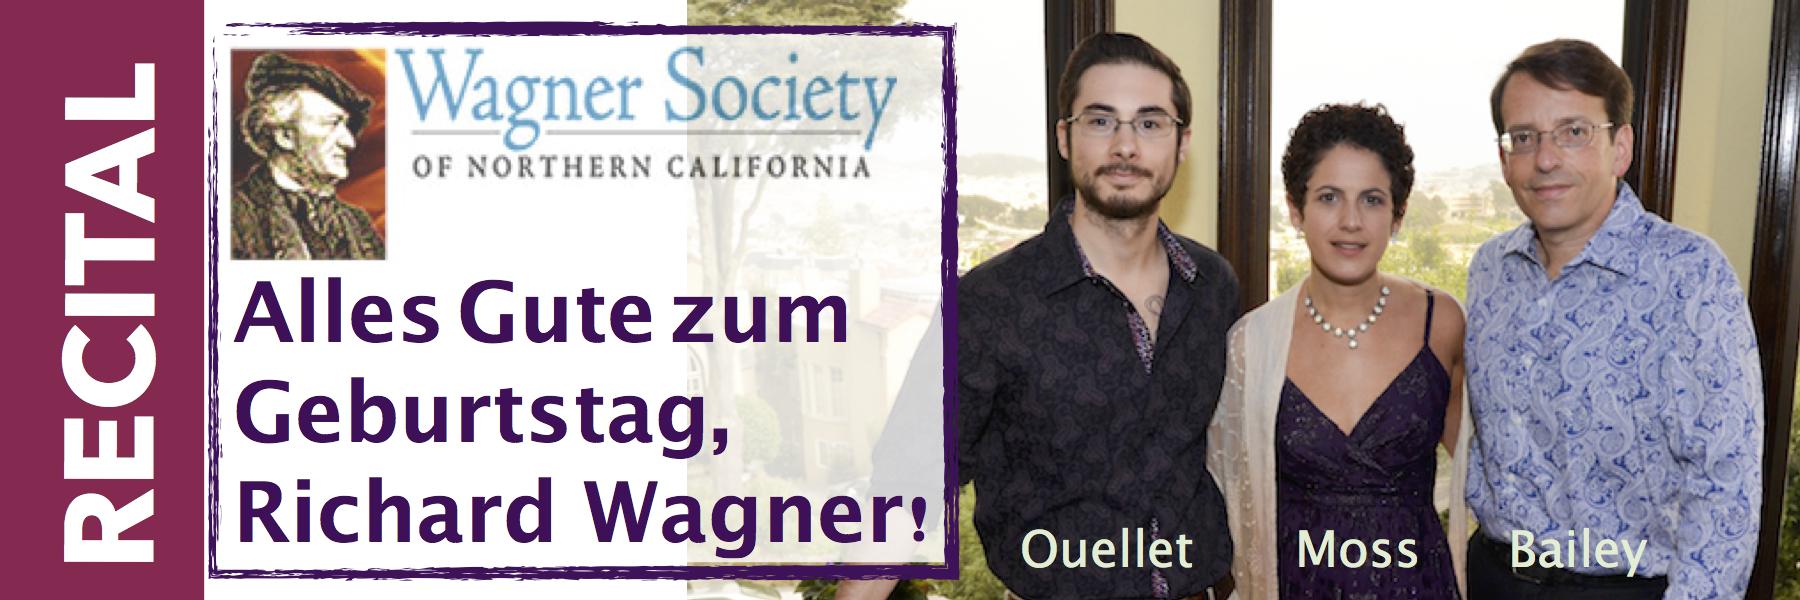 WagnerSociety2018.jpg